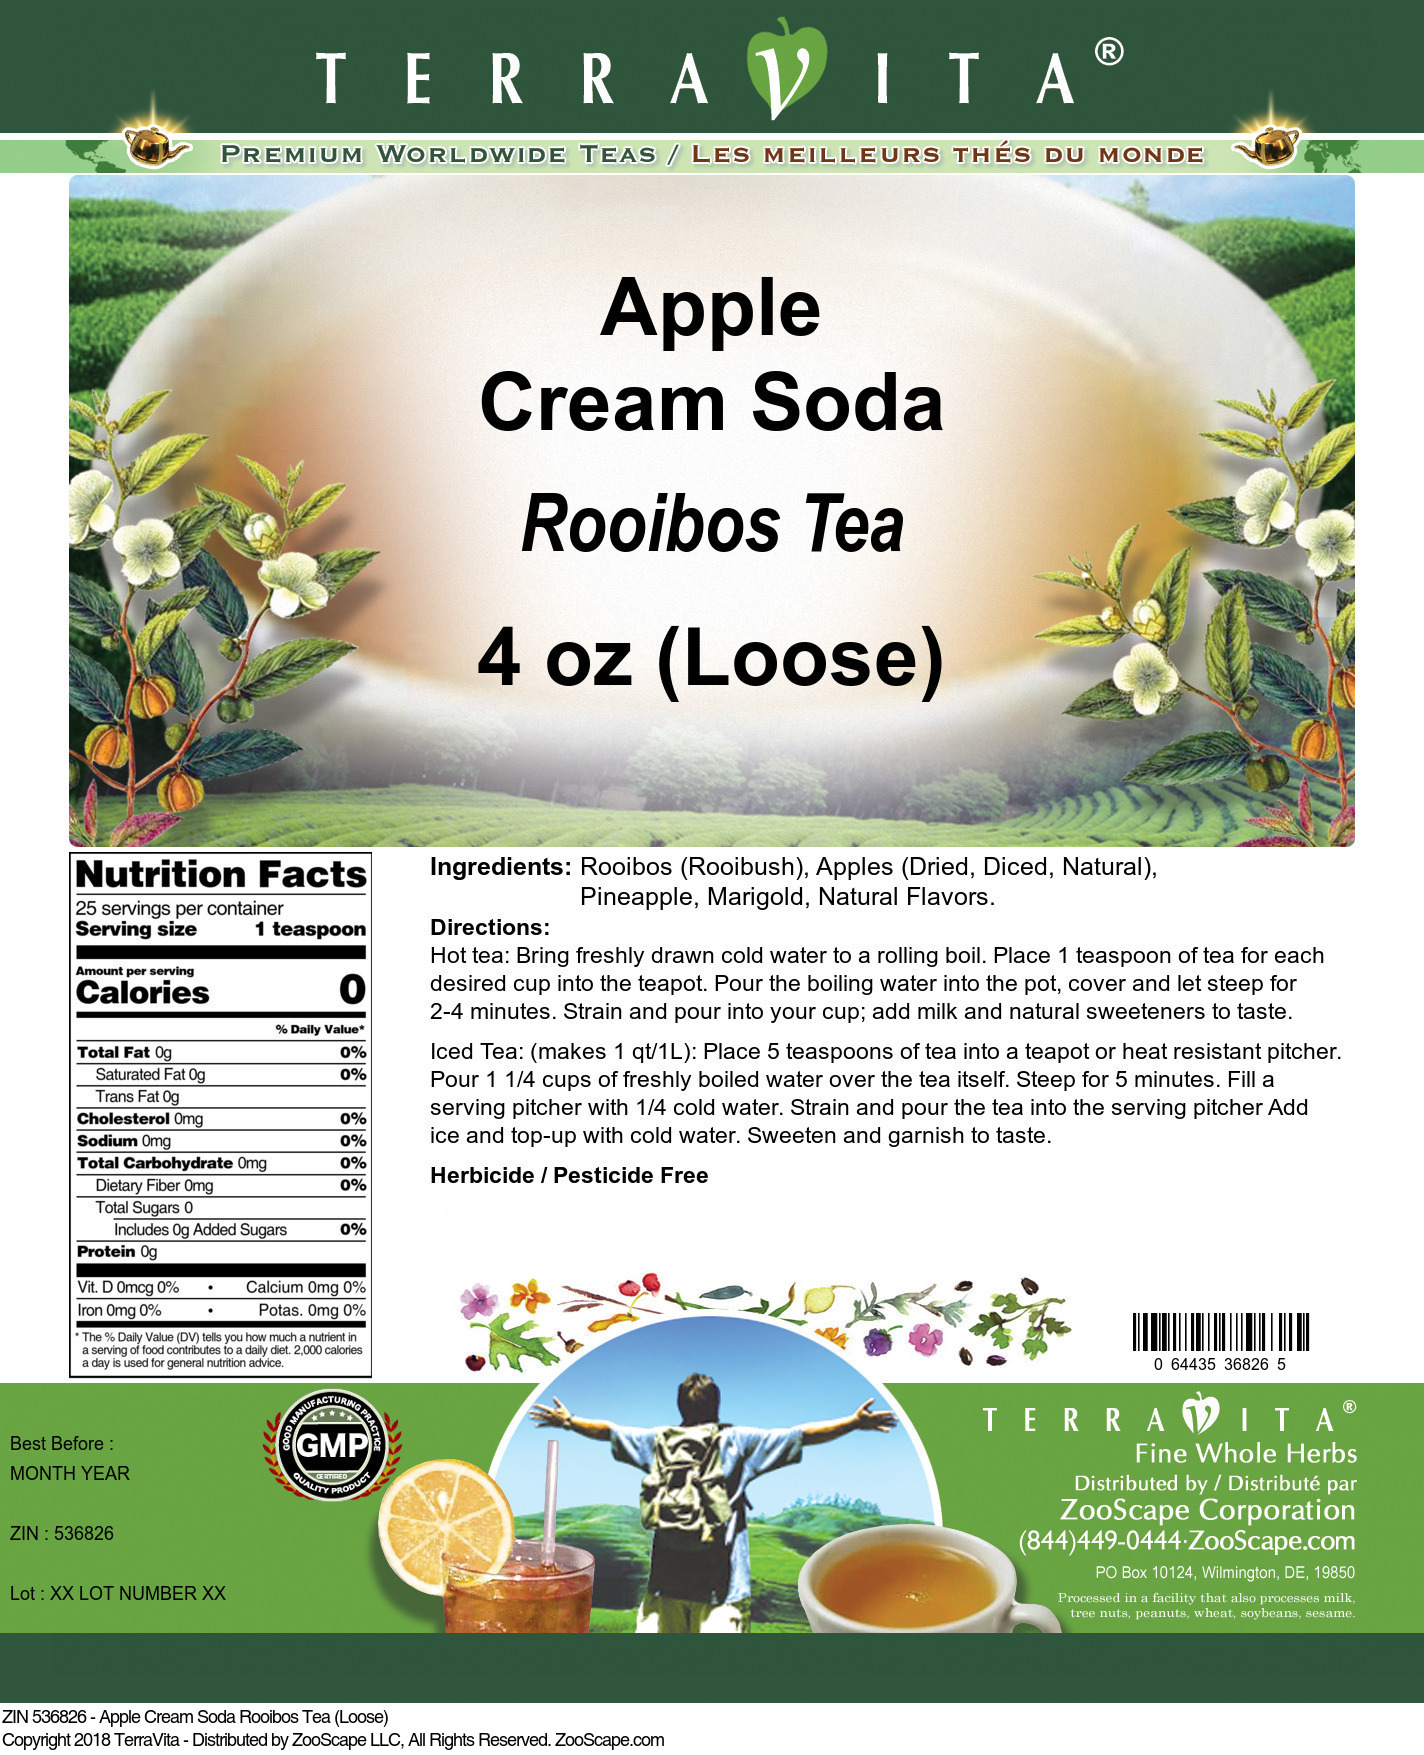 Apple Cream Soda Rooibos Tea